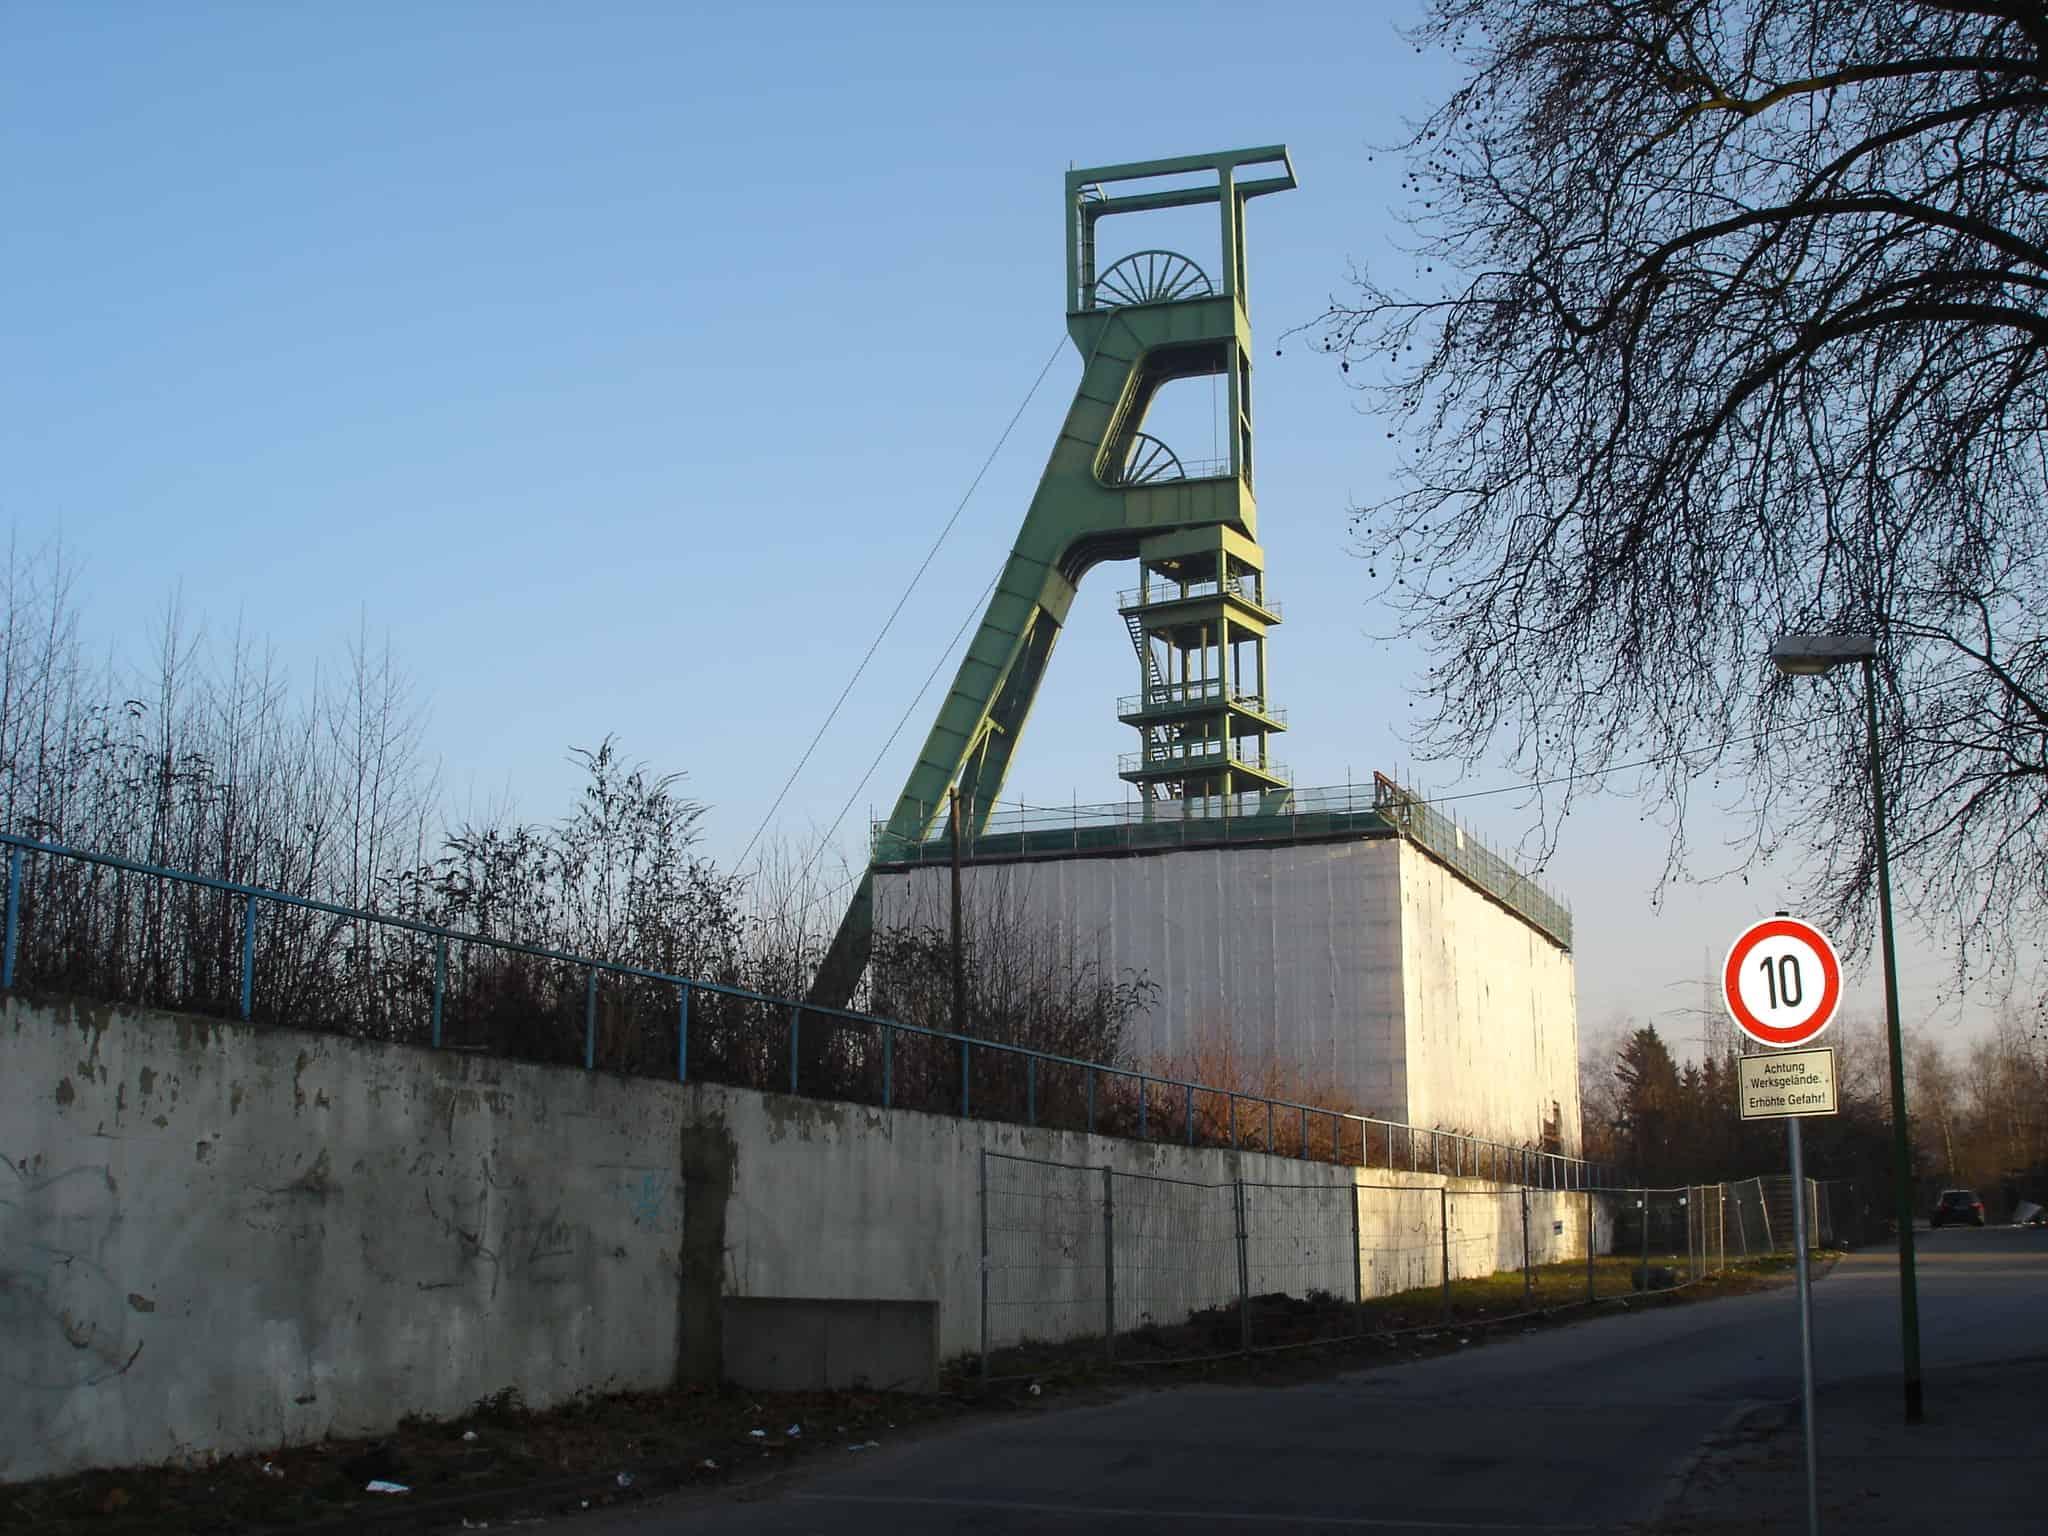 Zeche Sälzer-Amalie, Schacht Amalie in Essen,Foto:Revierkohe